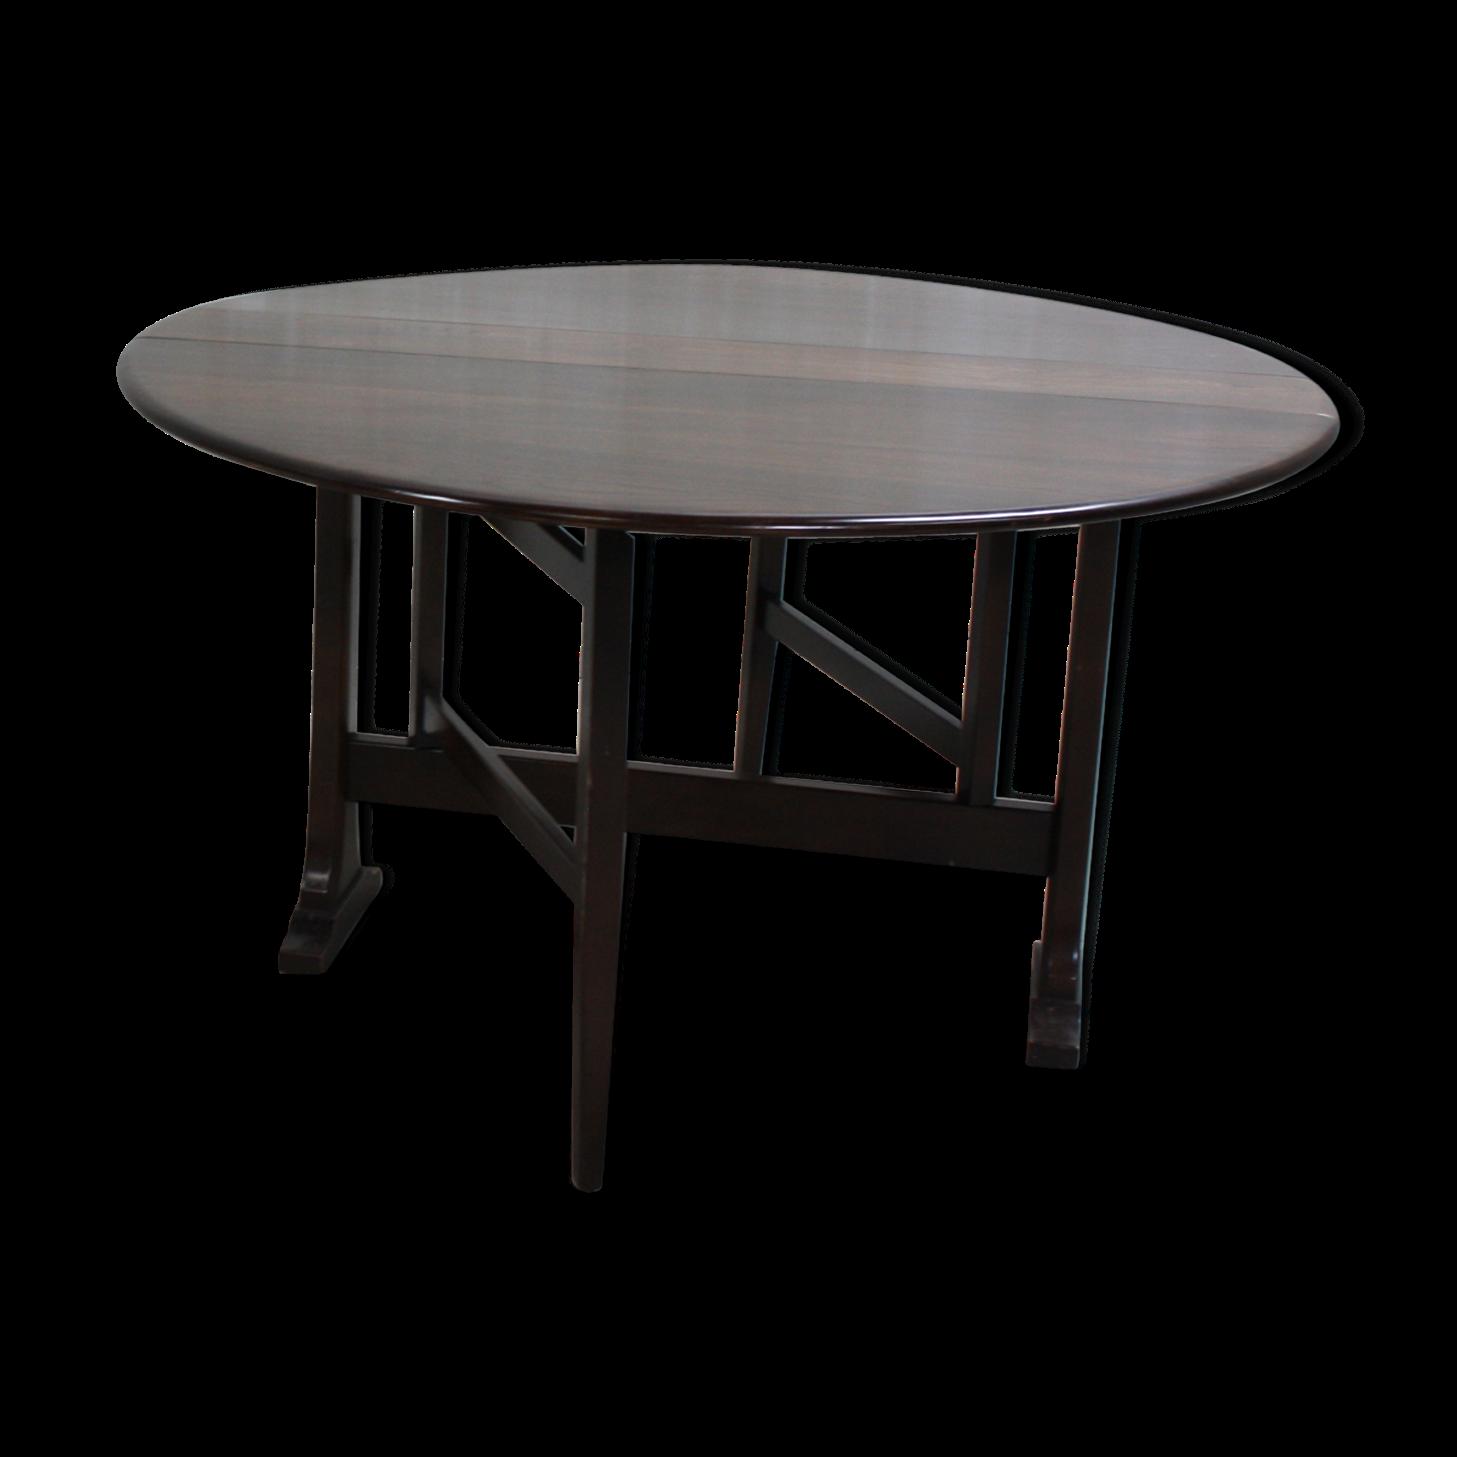 Table salle manger originale fashion designs for Table salle a manger baroque design